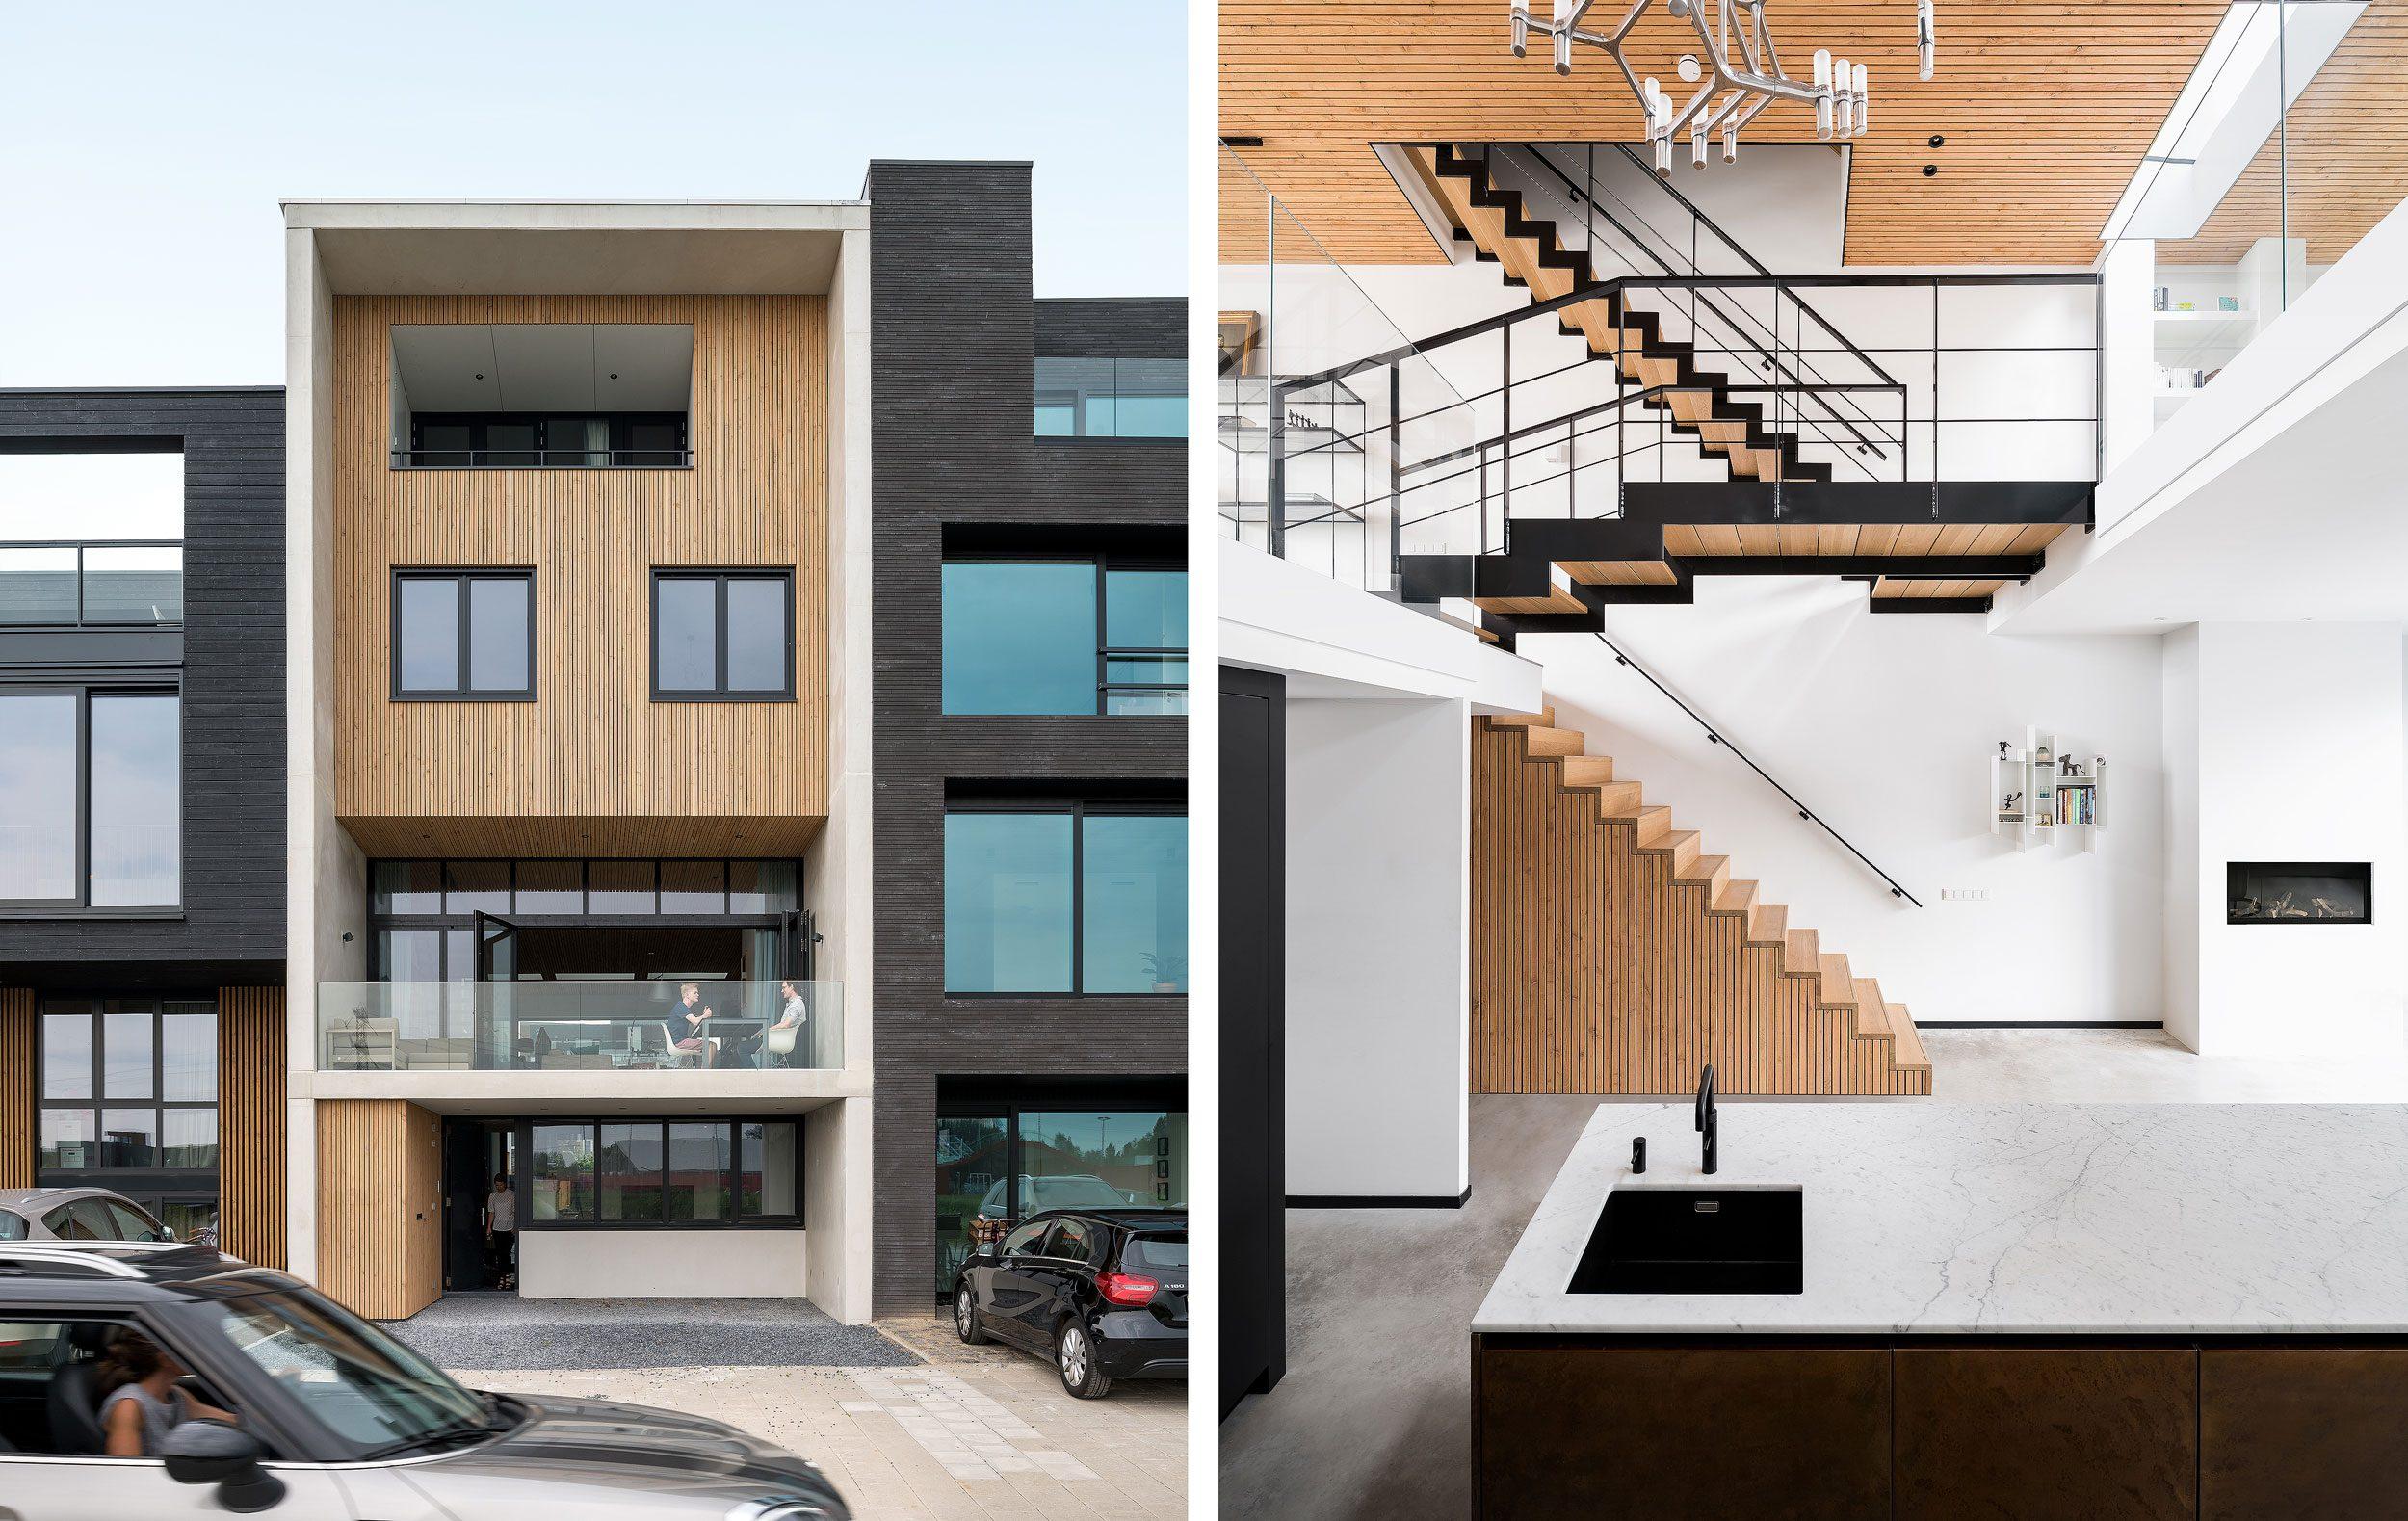 Chiel de Nooyer - architectuurfotograaf IJburg Amsterdam